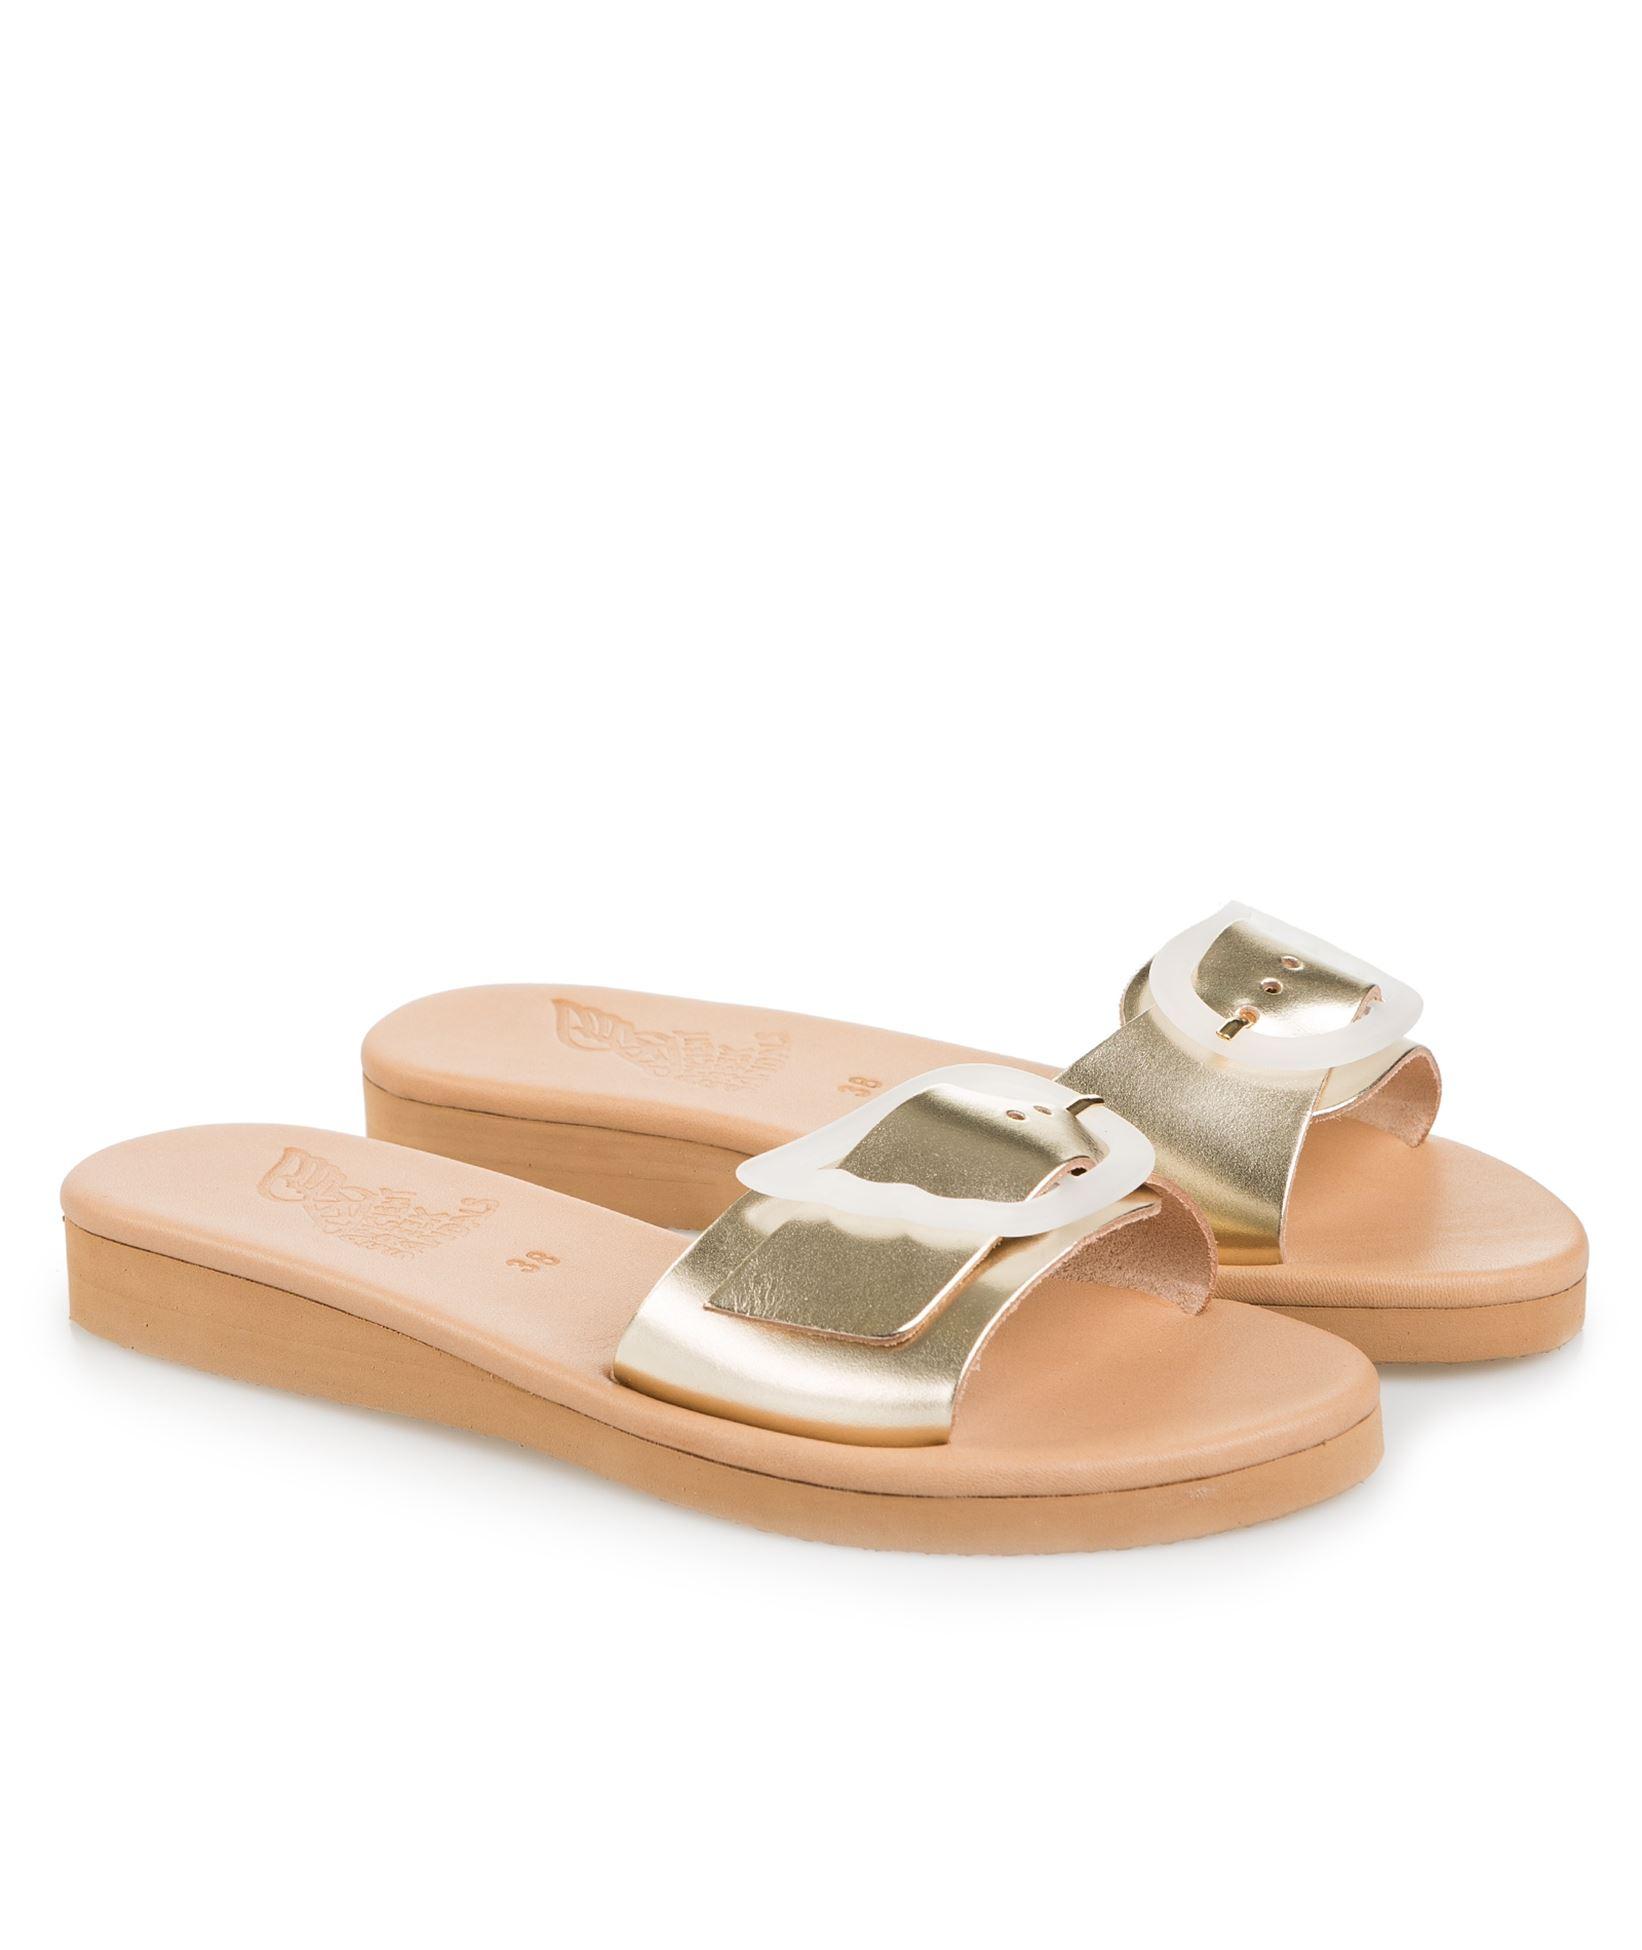 2266dc471 Ancient Greek Sandals Platinum Aglaia Sandals   Everyday Essentials ...